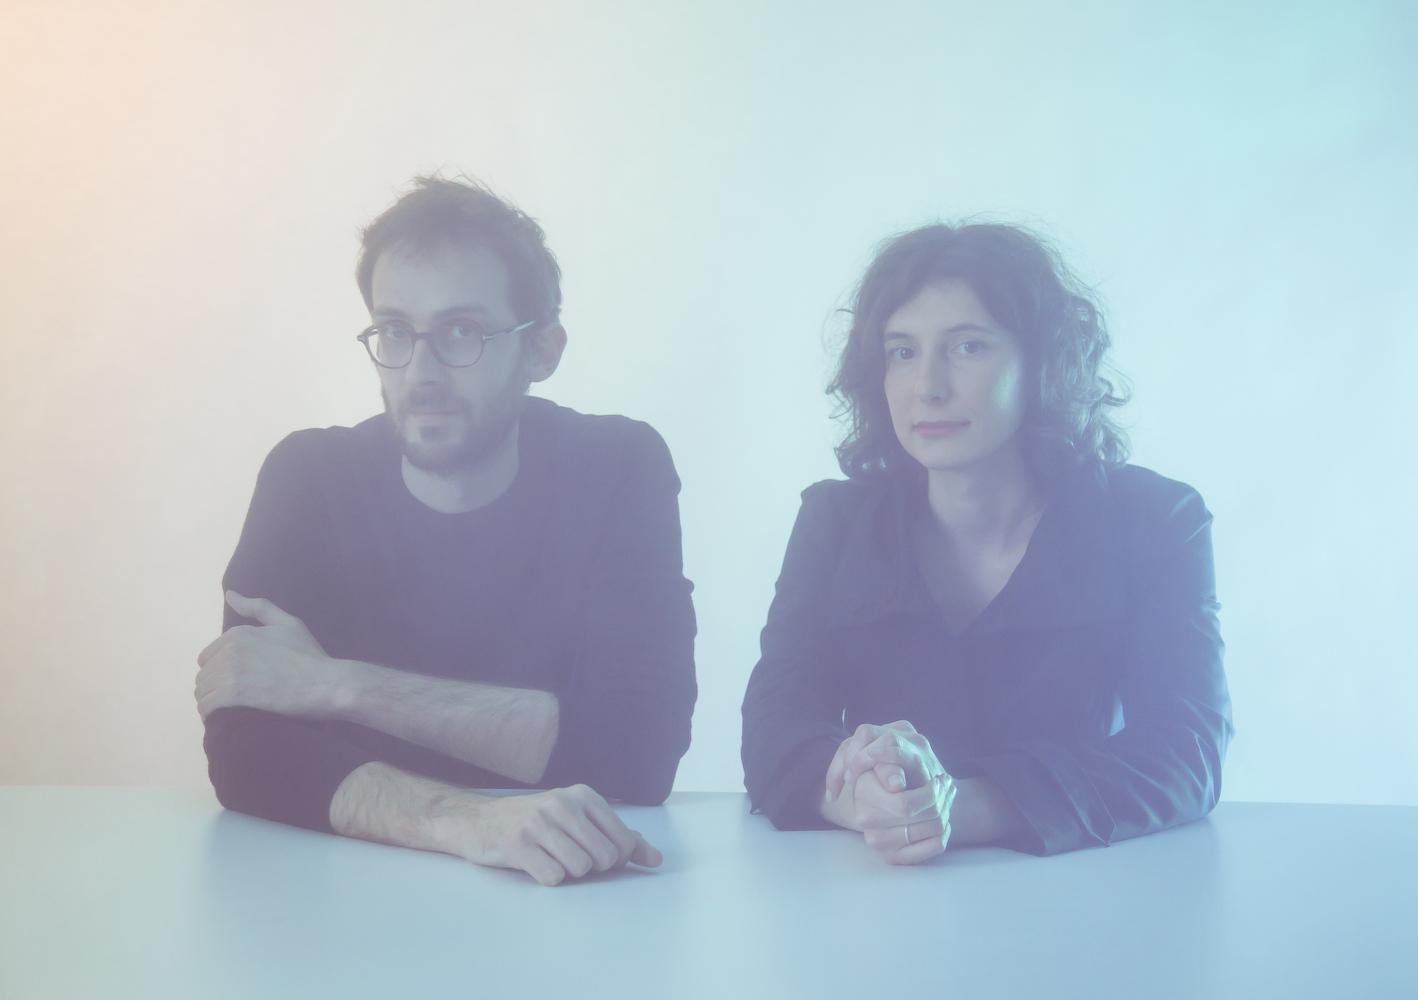 Elisa e Marco portait photo Delfino Sisto Legnani.jpg